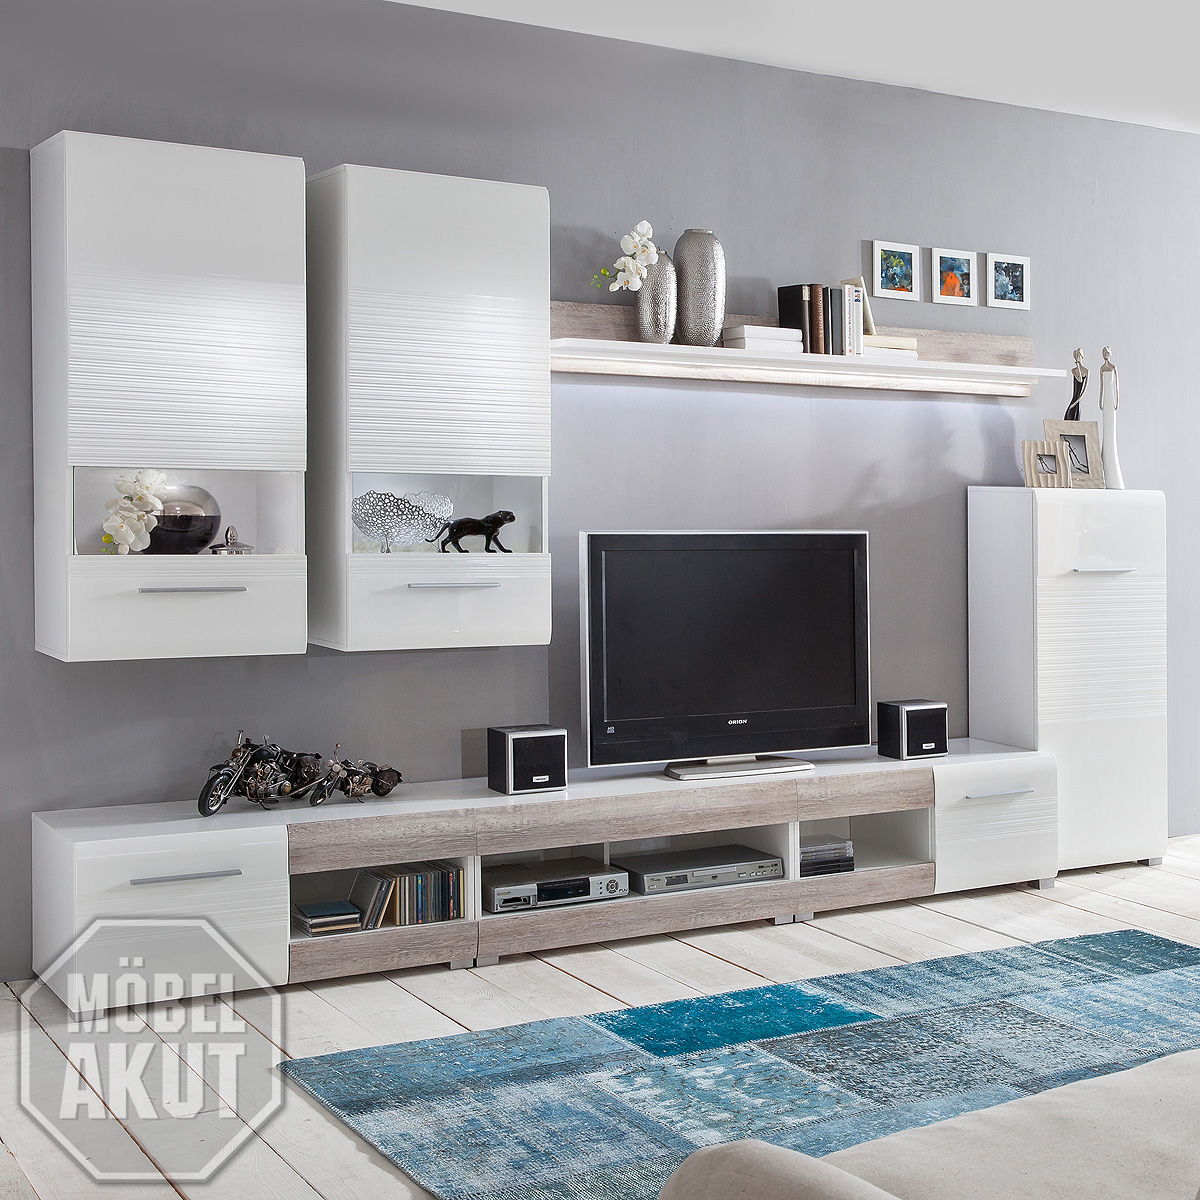 wohnwand items anbauwand wohnzimmer weiss hochglanz. Black Bedroom Furniture Sets. Home Design Ideas